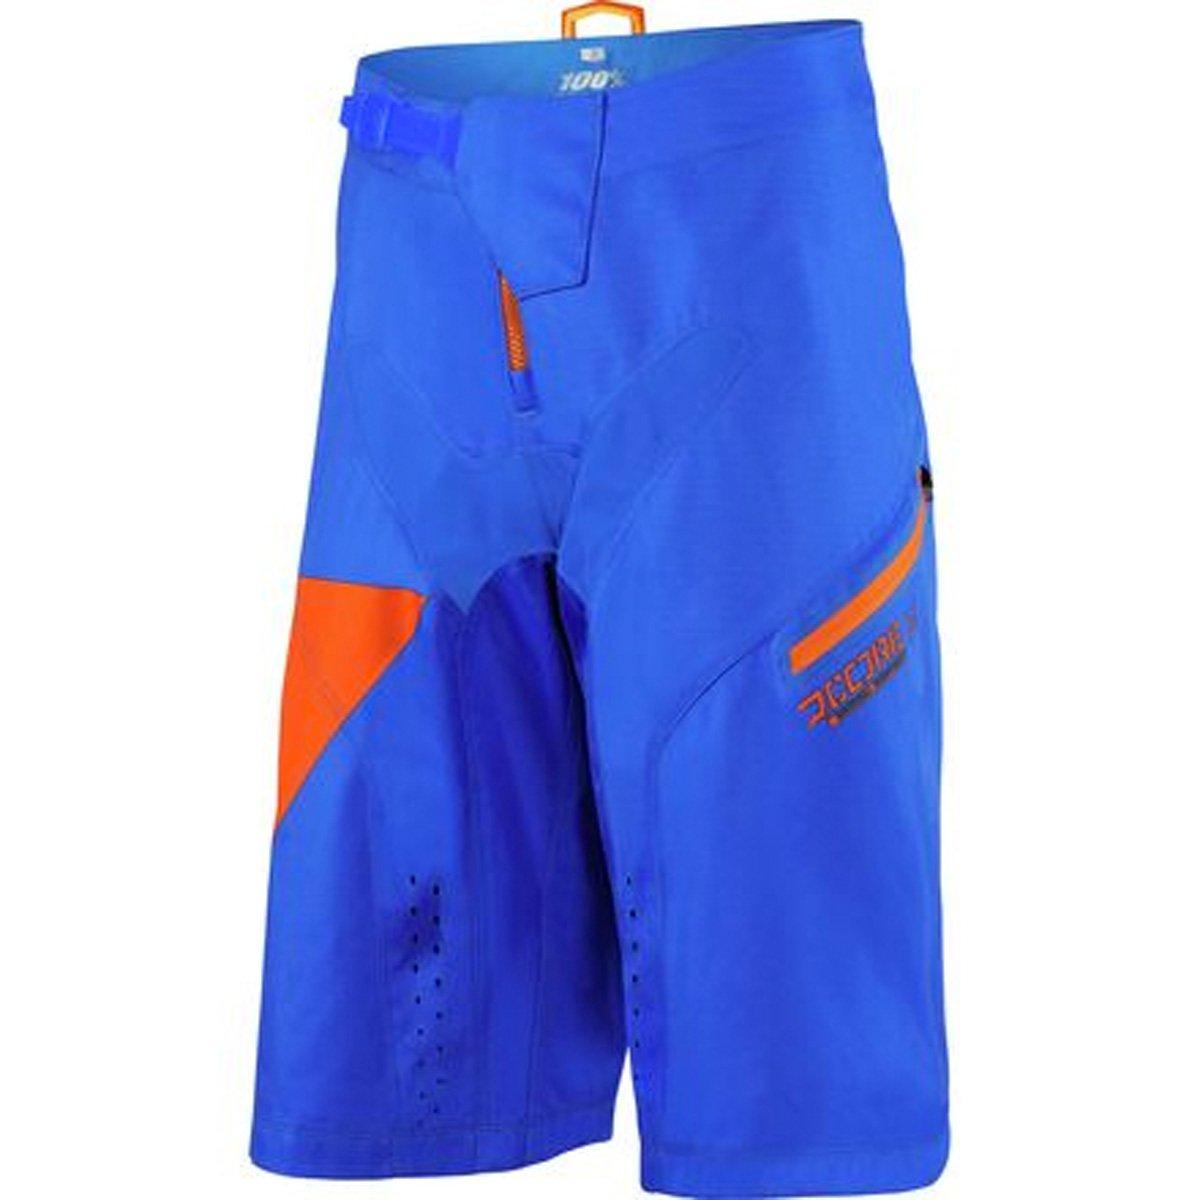 100 % r-core DH Short – Men 's B01LYHUC58 32|Nova Royal Nova Royal 32